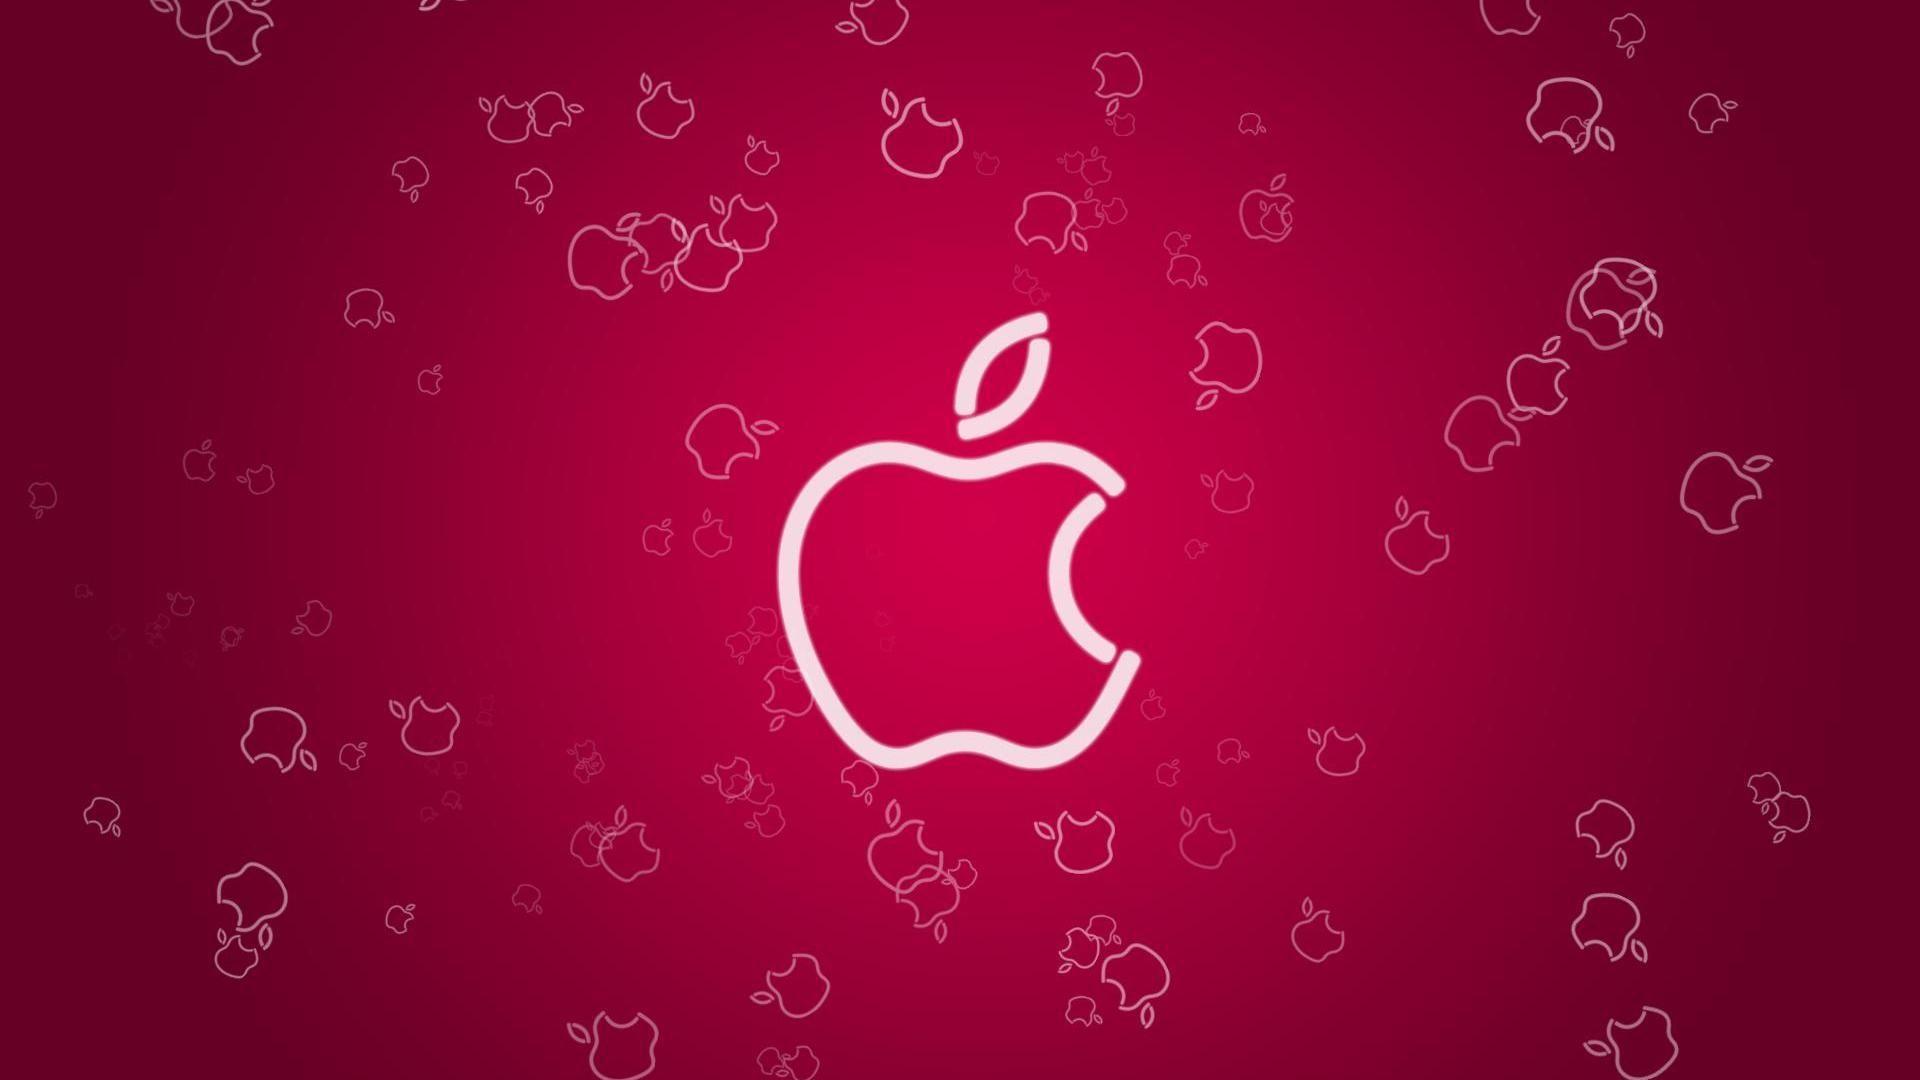 Wallpaper Of Apples Gallery Plus Ipad Mini Wallpaper Apple Logo Wallpaper Iphone Apple Wallpaper Iphone